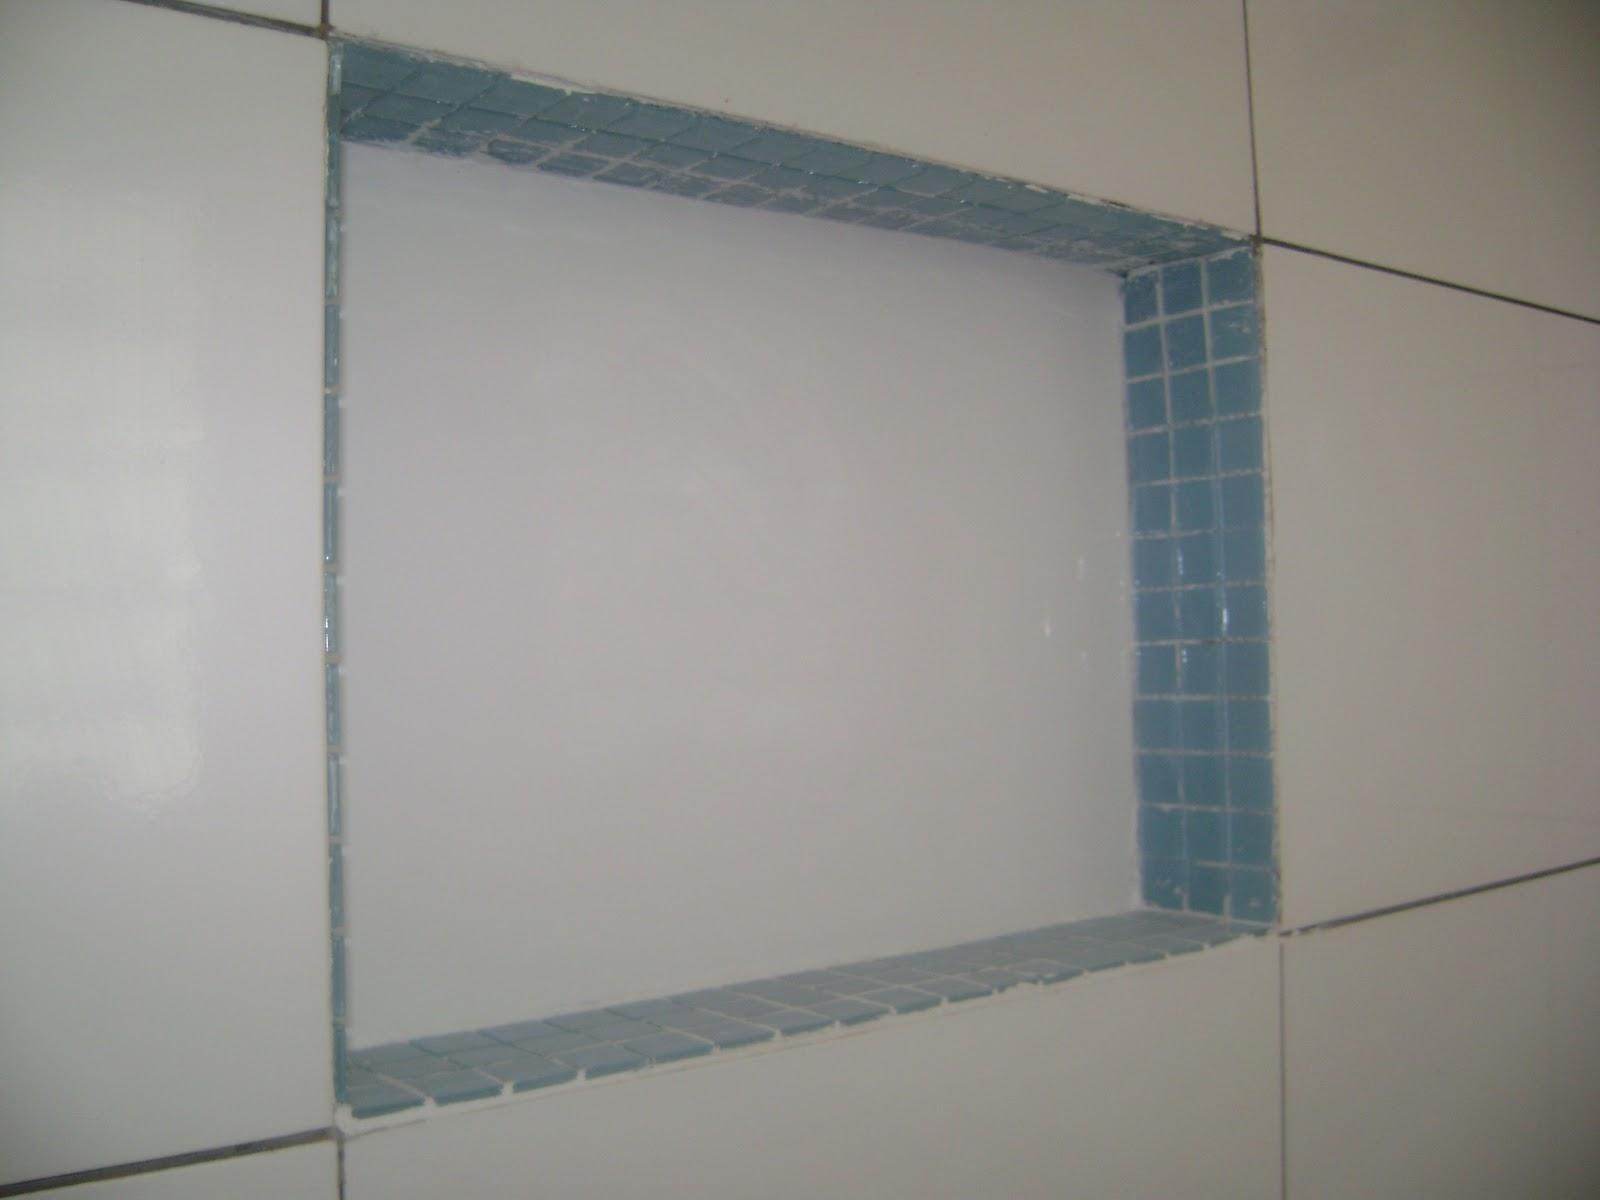 Travel and House Banheiro  Nicho -> Nicho Banheiro Box Medidas